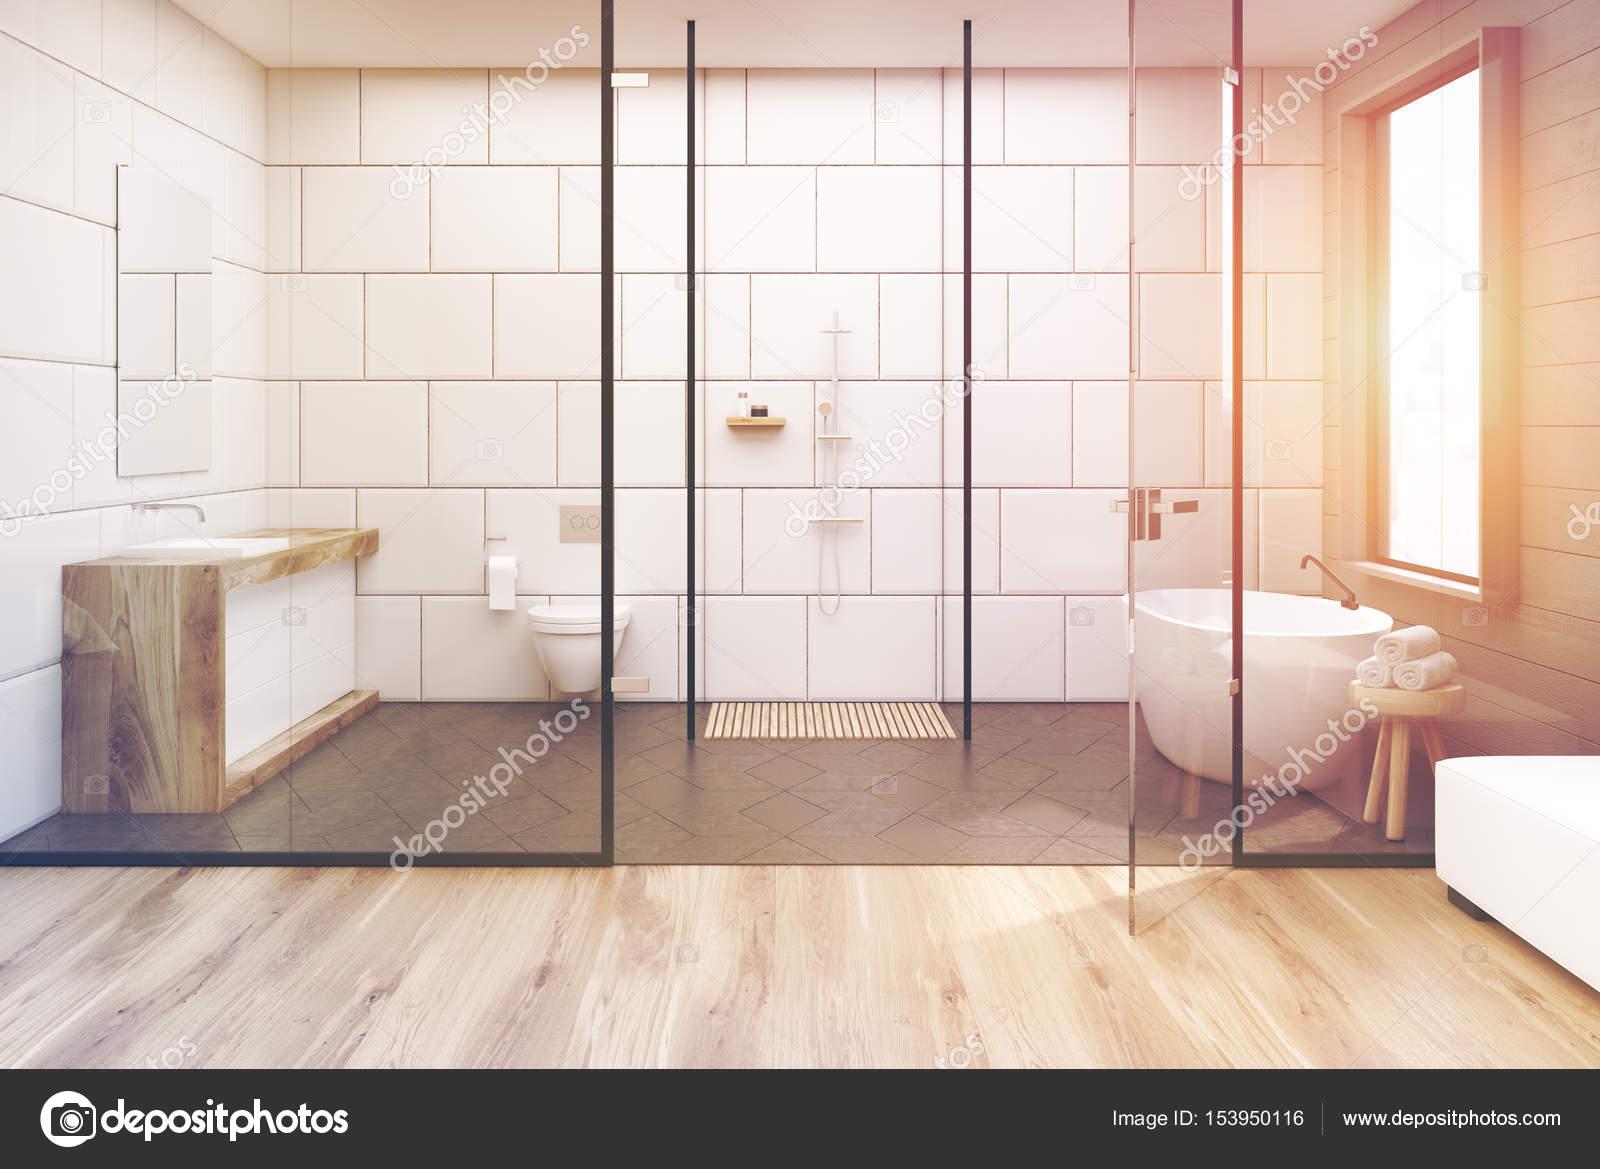 Glazen muur badkamer, afgezwakt — Stockfoto © denisismagilov #153950116